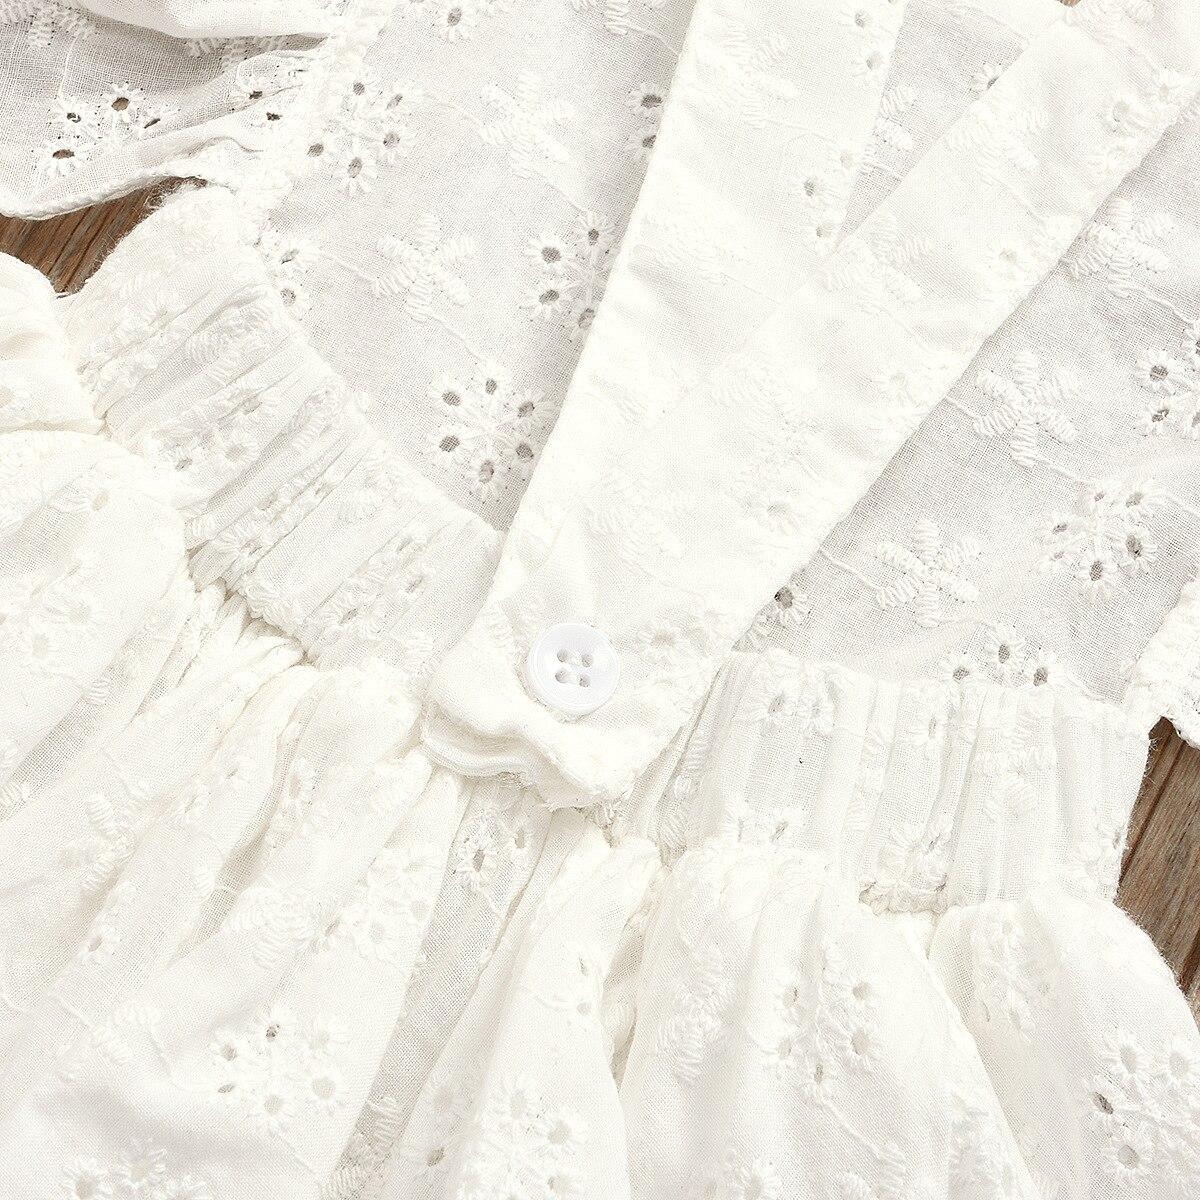 Qunq White Lace Baby Girls Romper With Headband Summer Ruffle Sleeve Infant Girls Dress 1 Year Newborn Princess Birthday Costume